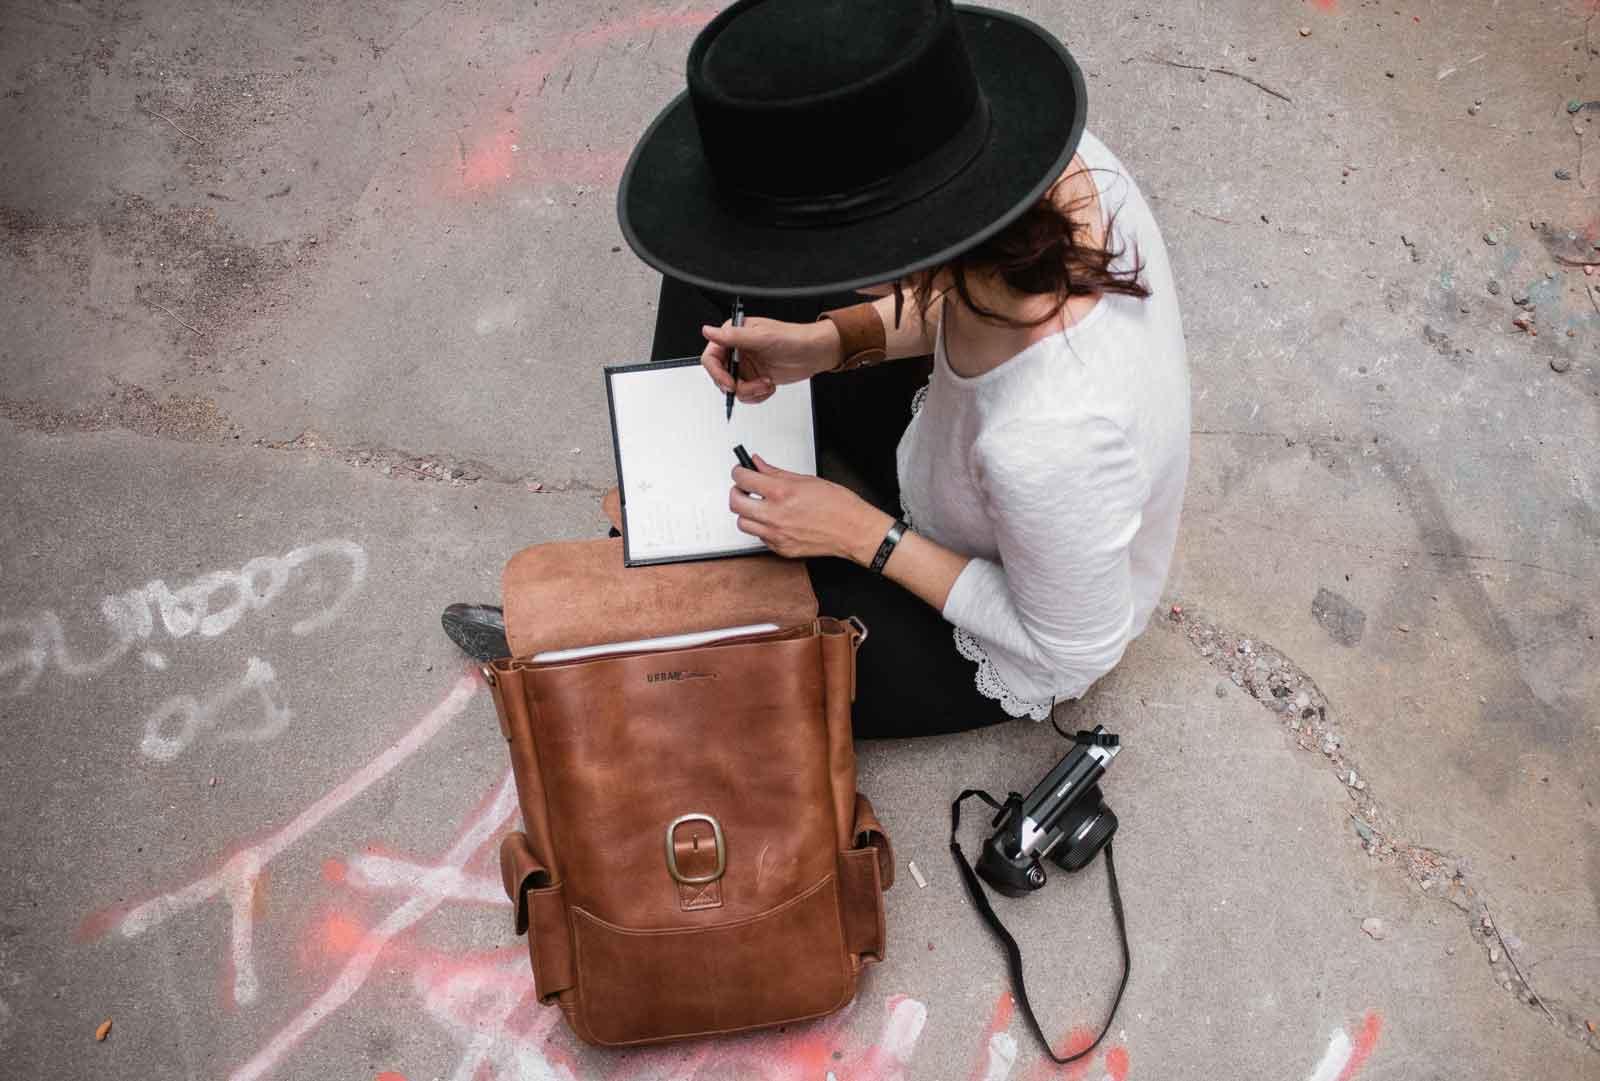 meg_delagrange_writing_author_leather_bag.jpg